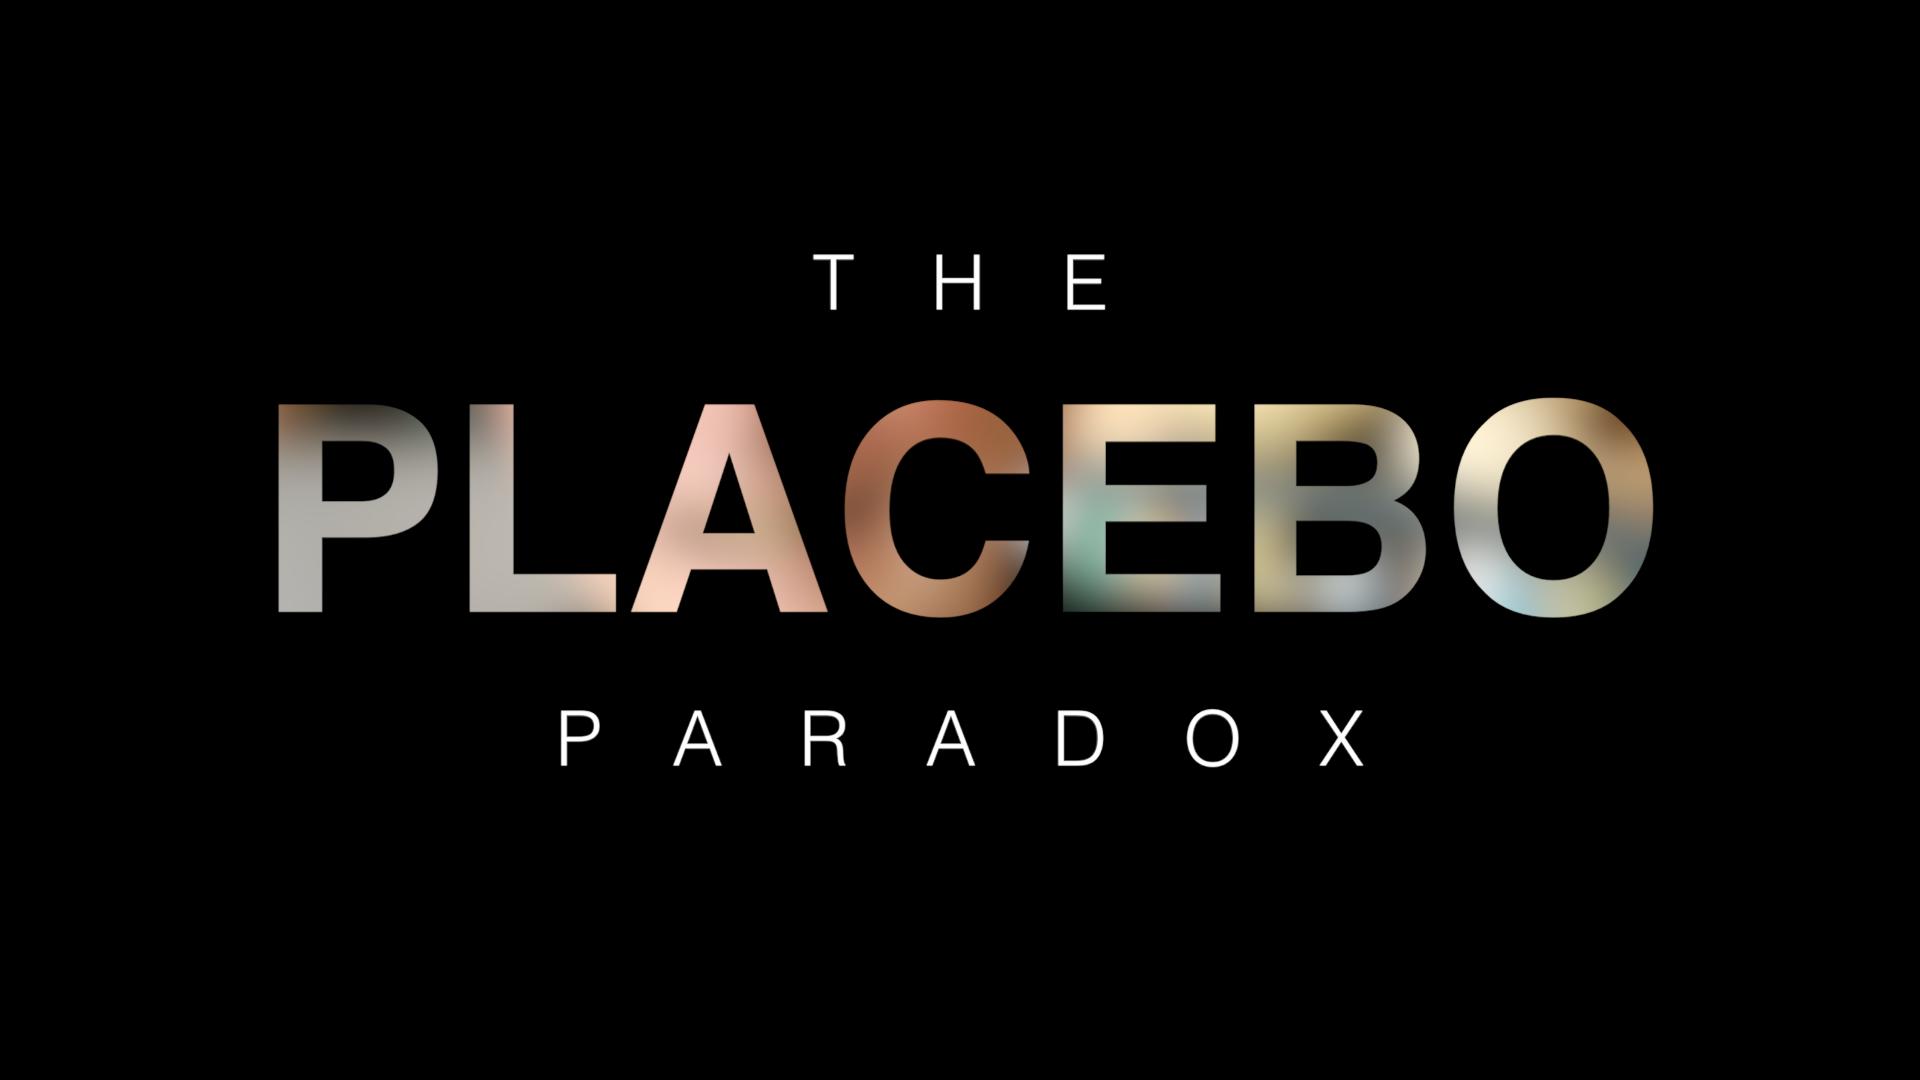 placebo-paradox-titles.png